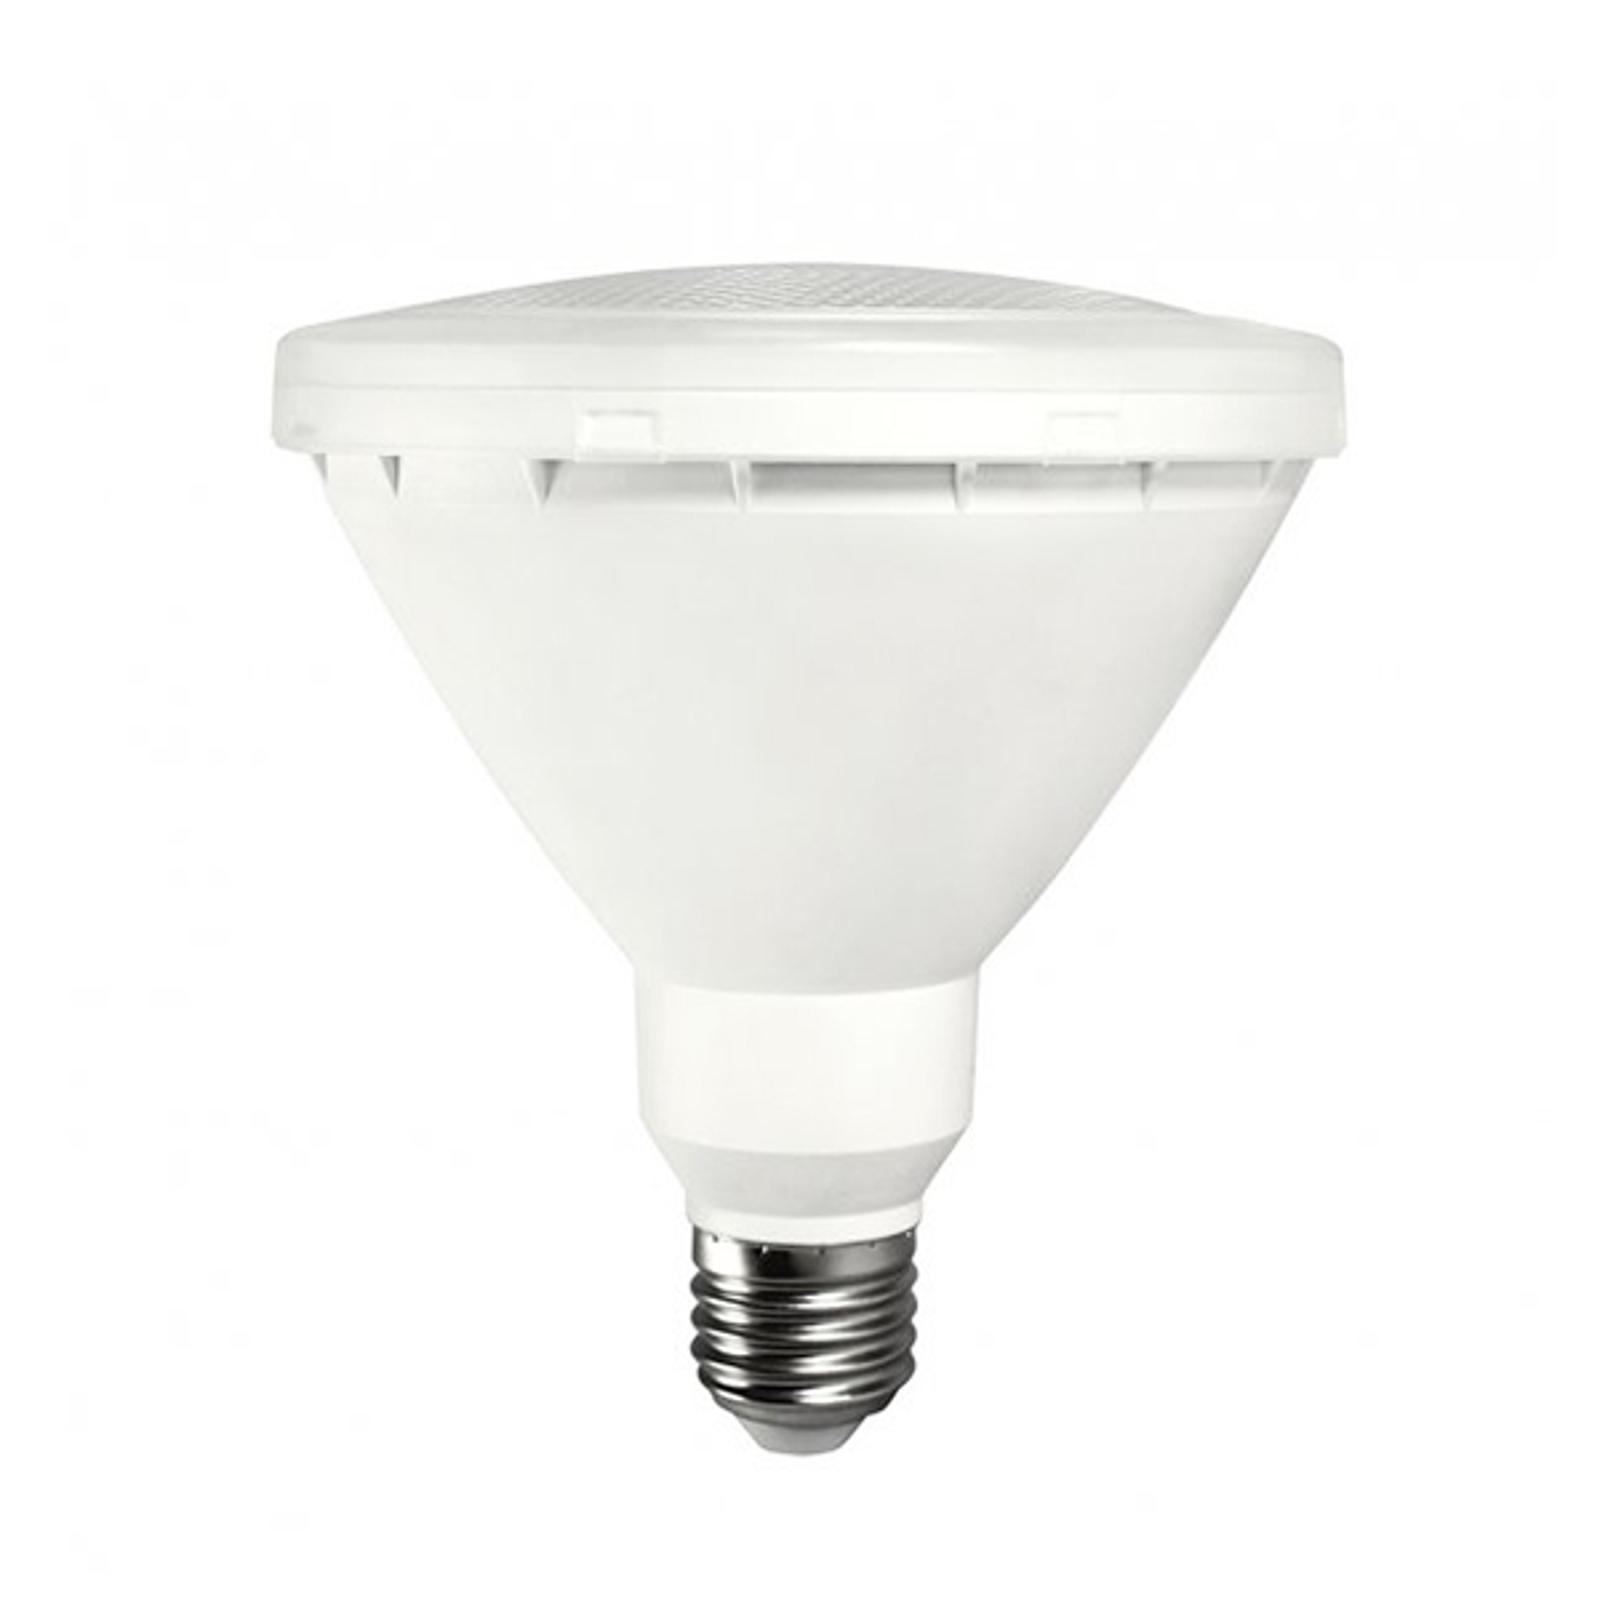 Faretto LED E27 15 W 840 RODER PAR38 tenuta stagna